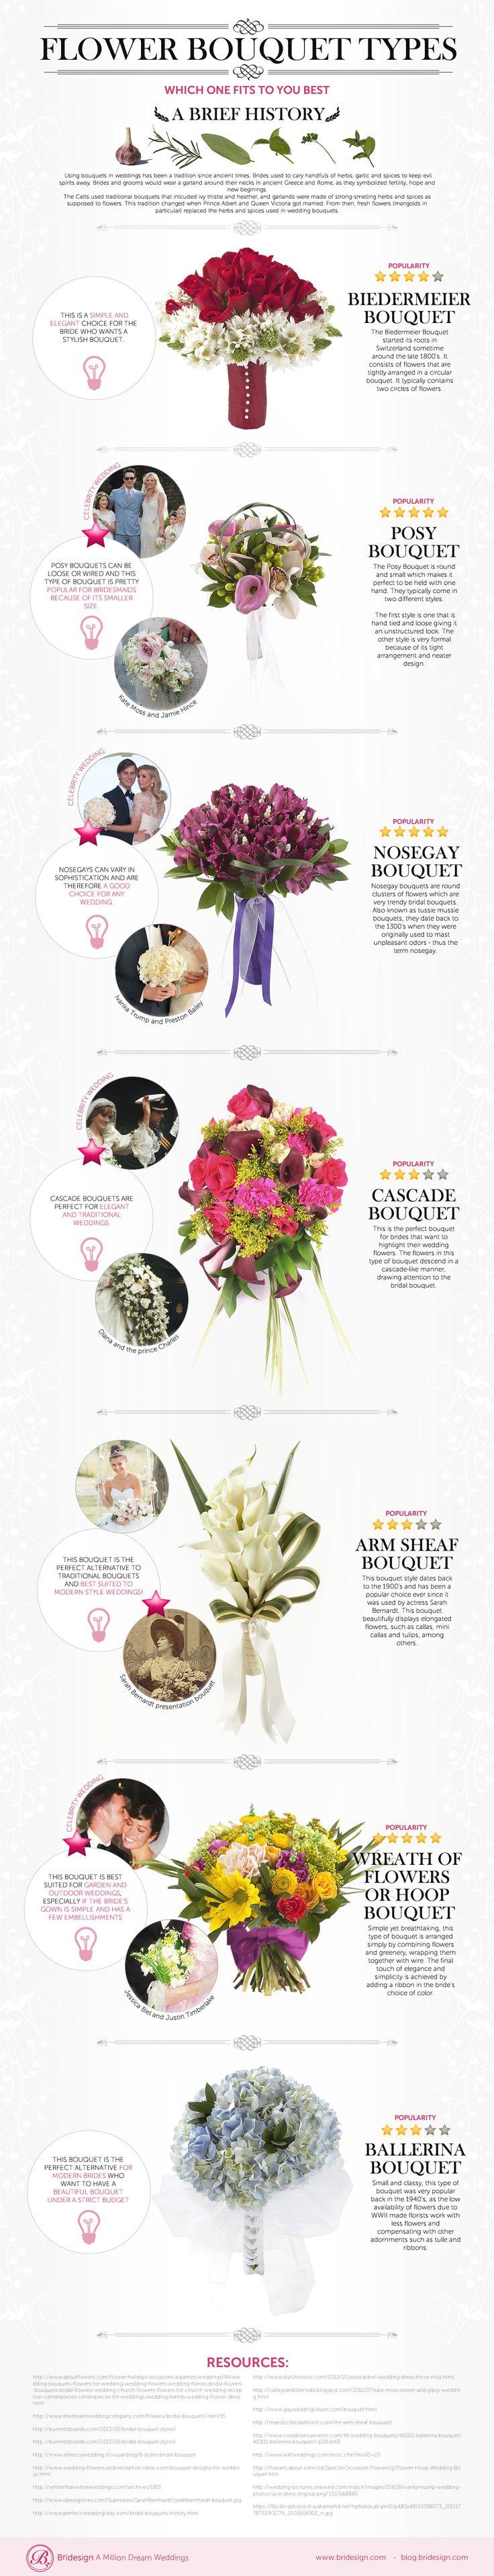 types of flower bouquets for weddings flowers pinterest. Black Bedroom Furniture Sets. Home Design Ideas